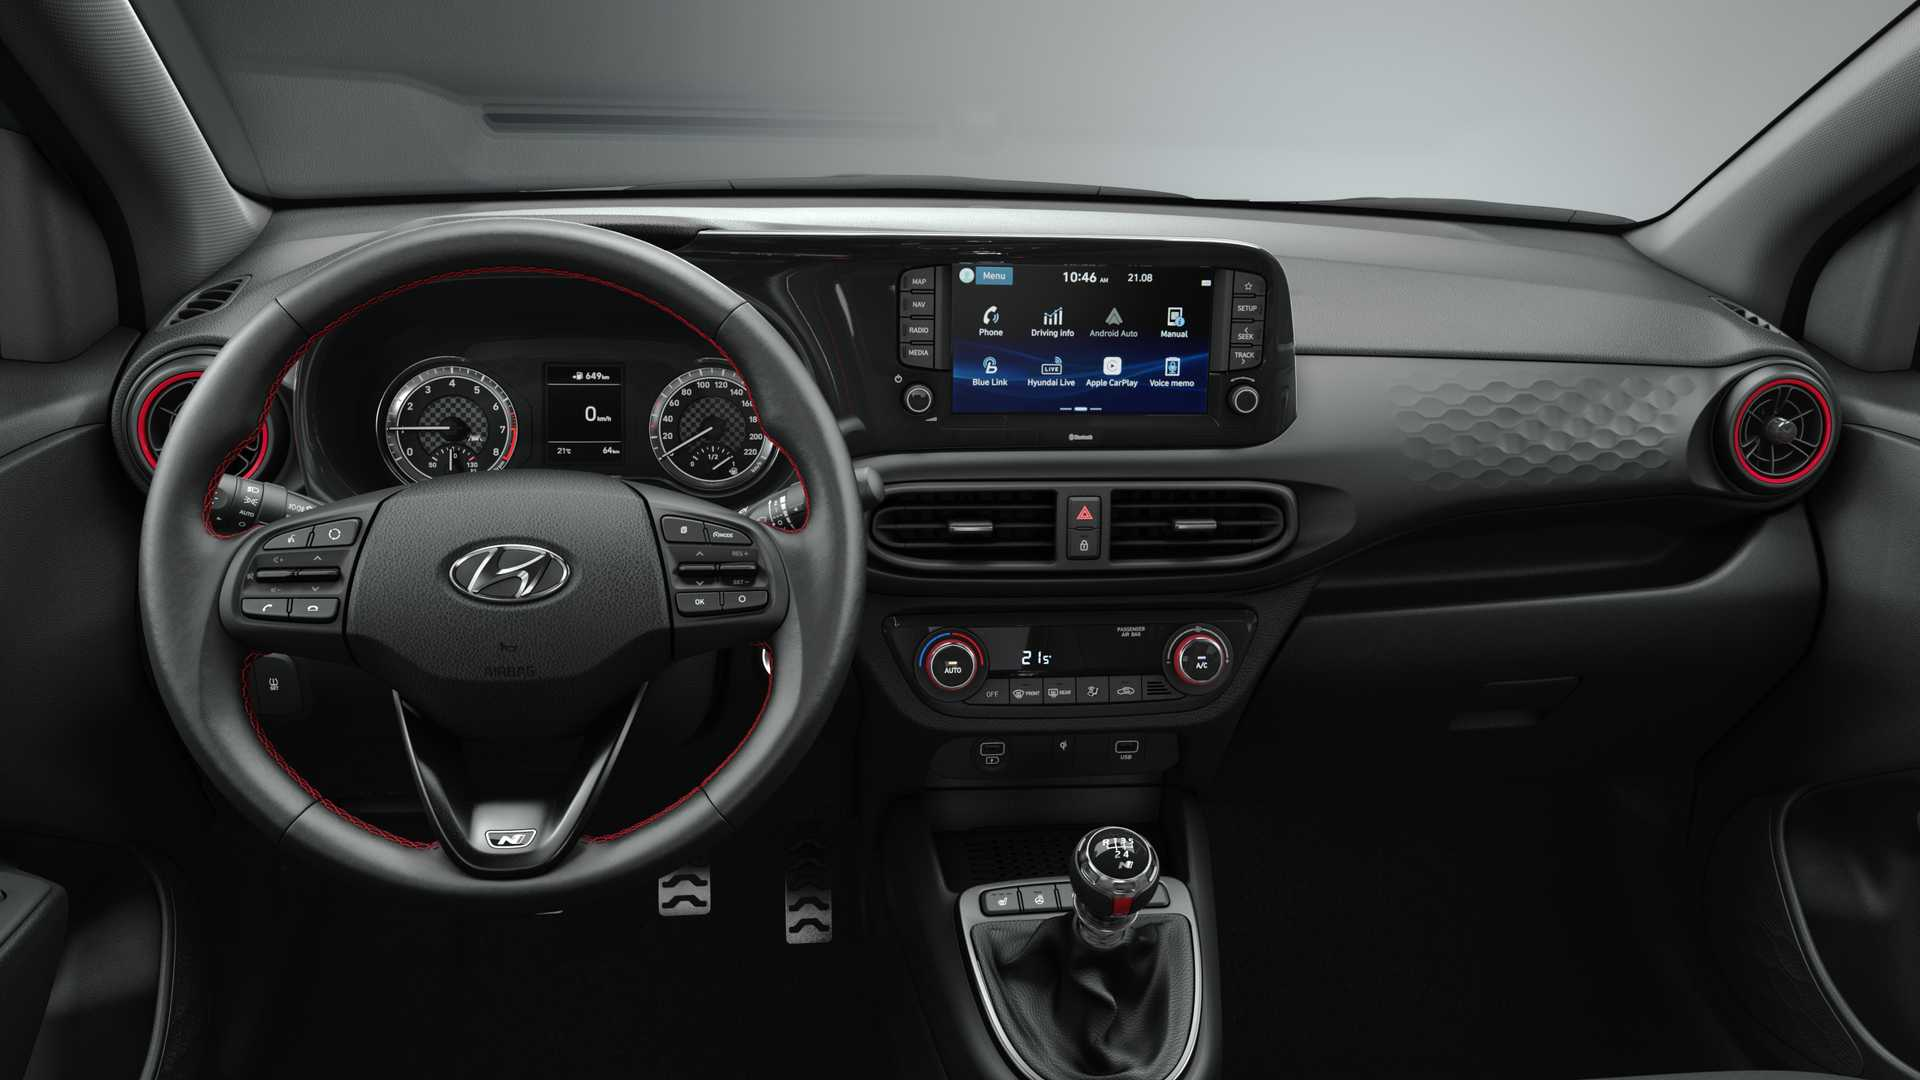 2020 Hyundai I10 Revealed With Upscale Design Better Interior